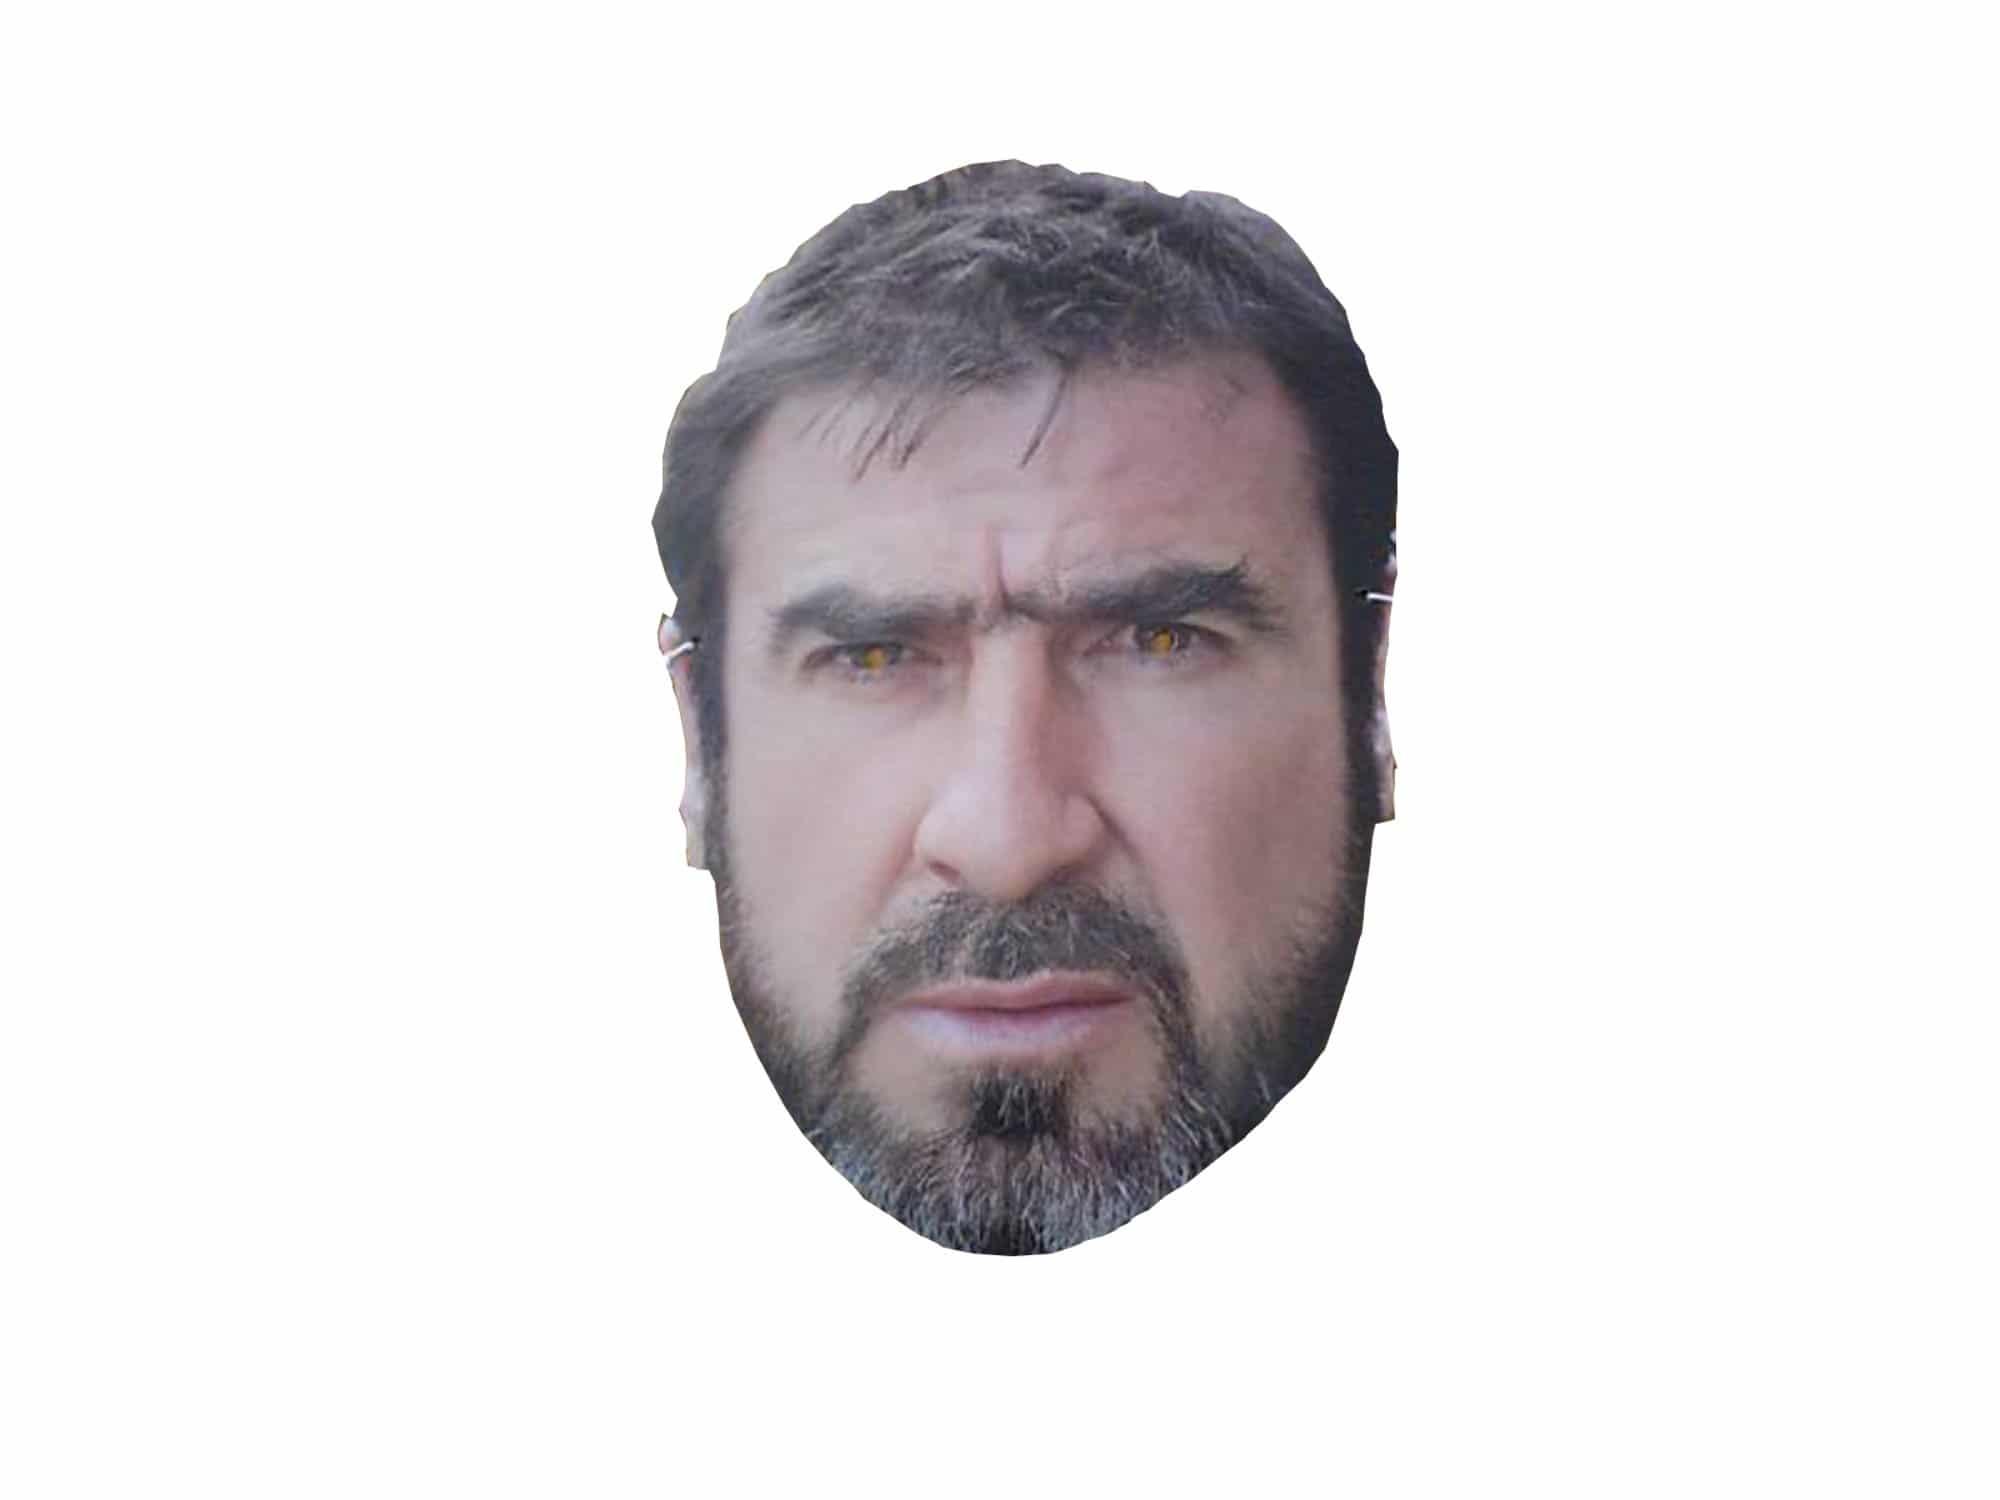 Cantona Mask